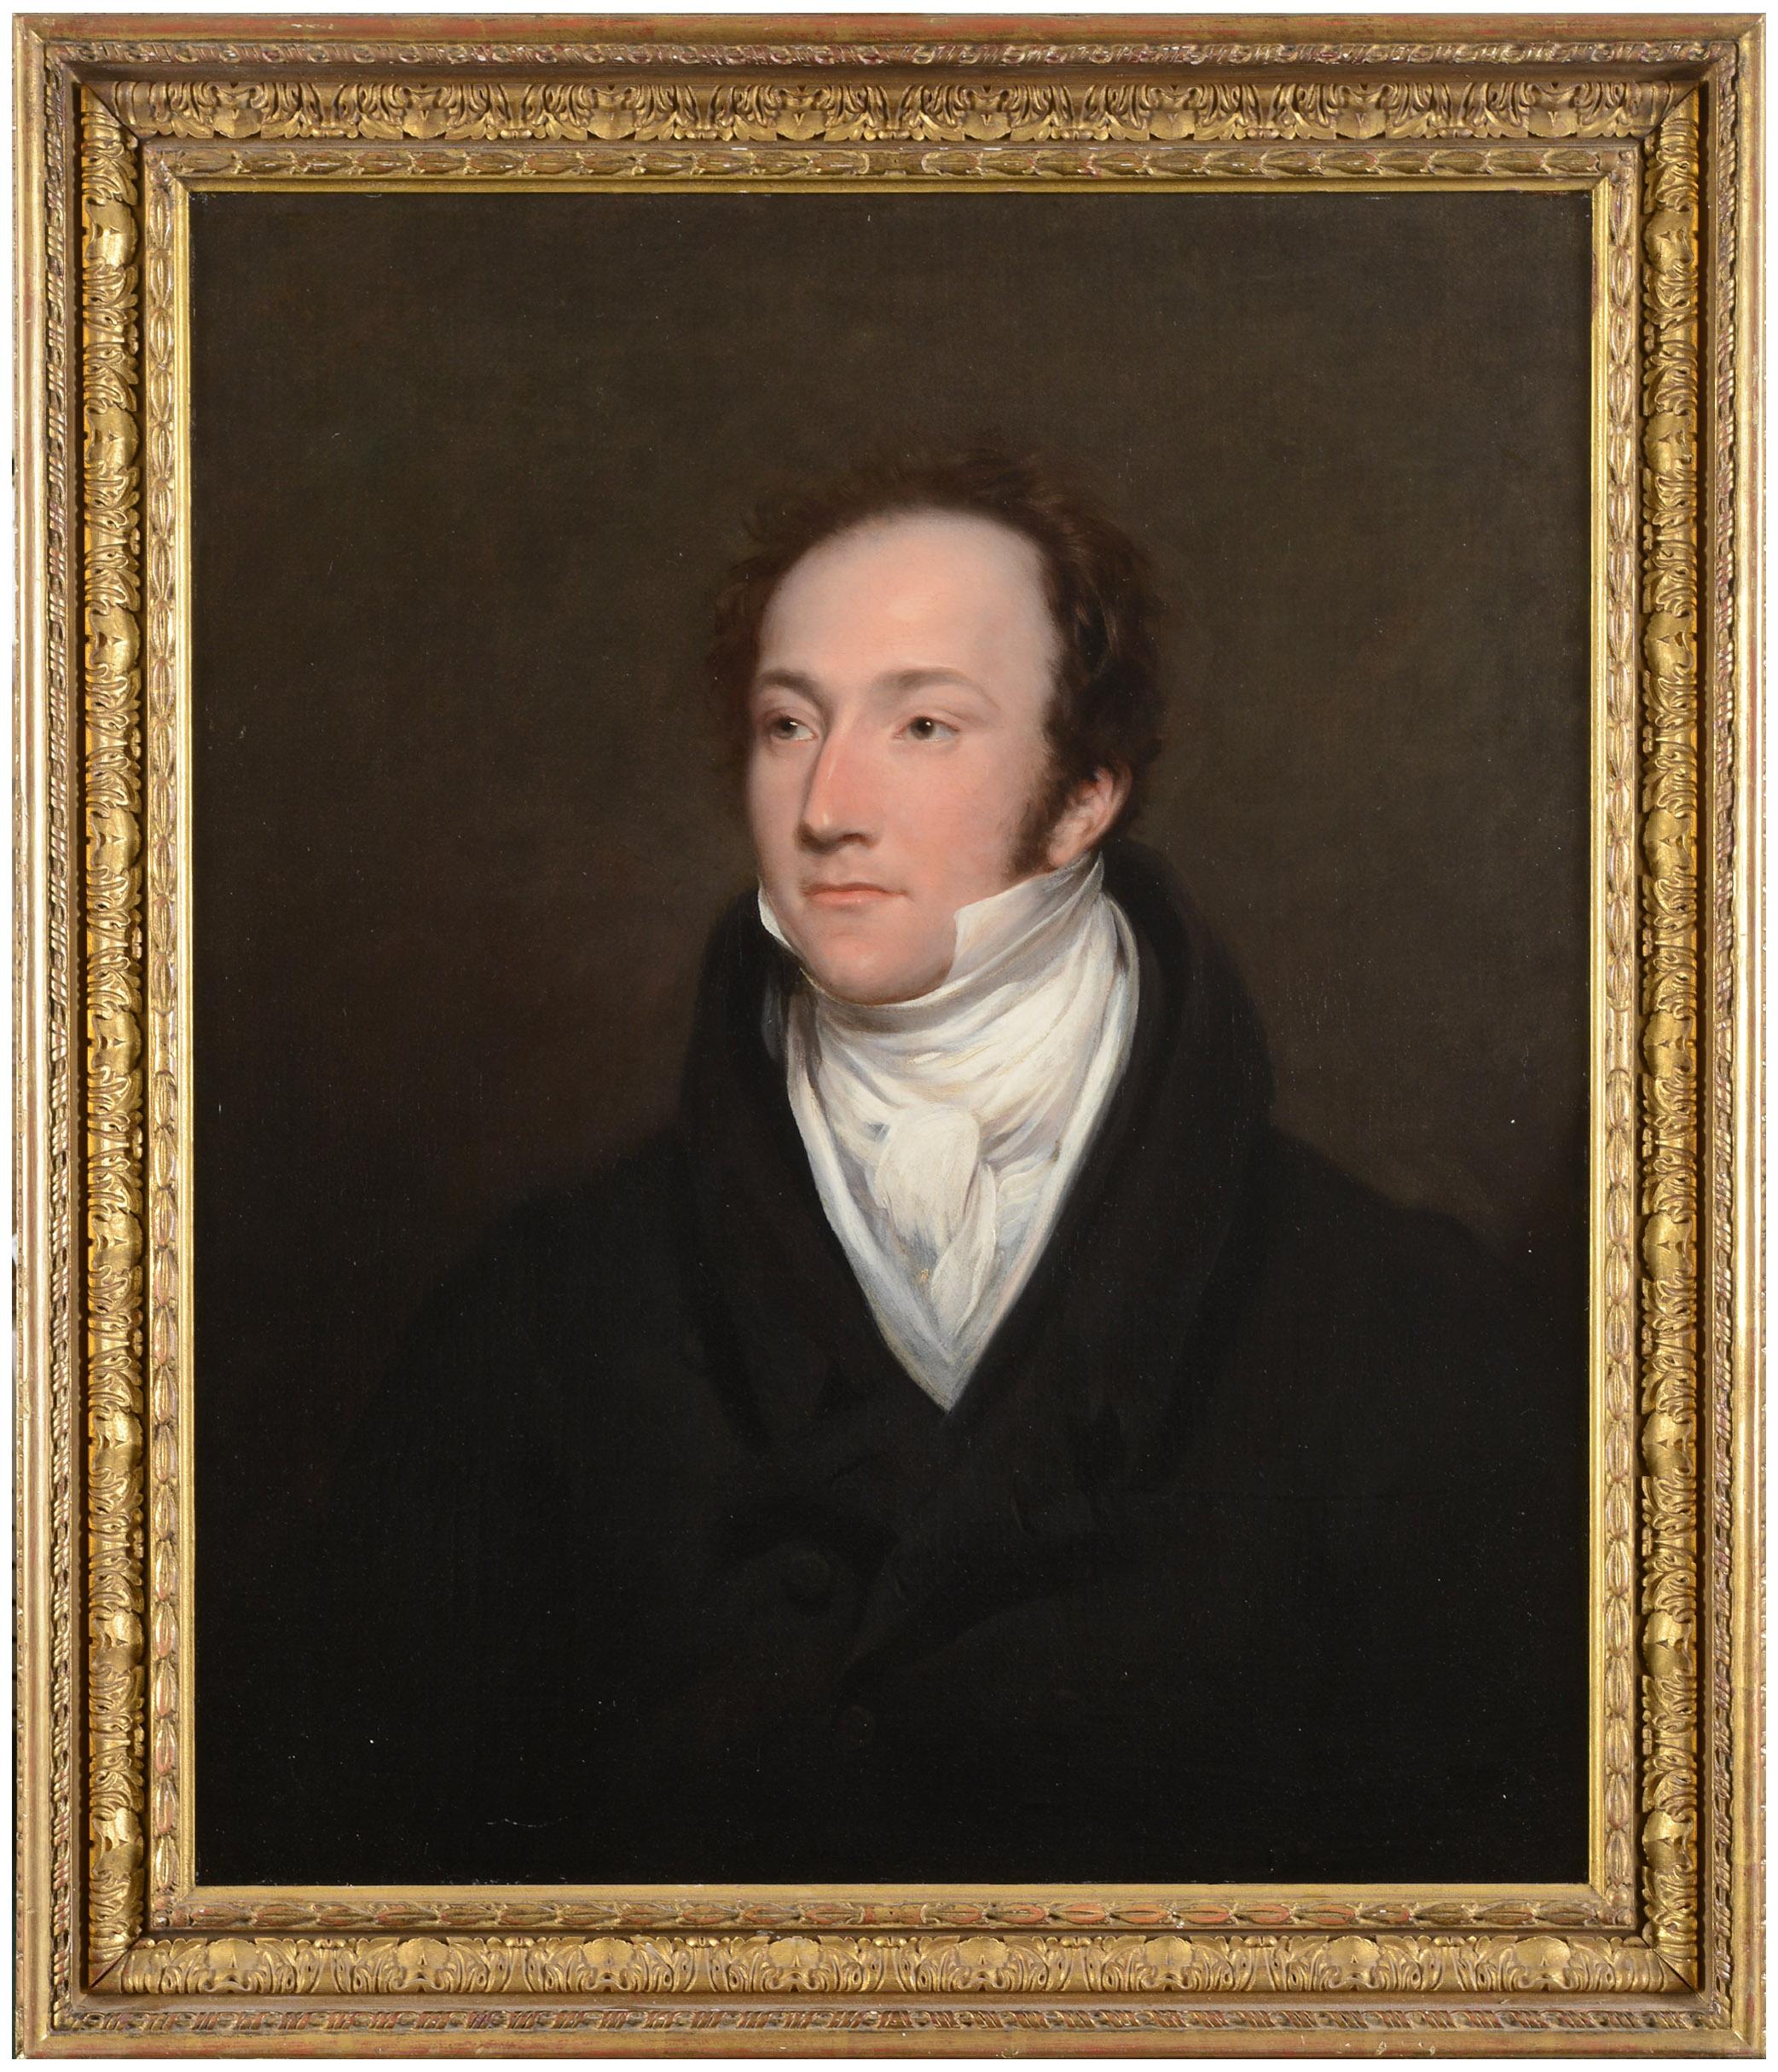 Lot 2185 - SIR THOMAS LAWRENCE, PRA (1769-1830) PORTRAIT OF A GENTLEMAN, BELIEVED TO BE PHILIP JOHN MILES,